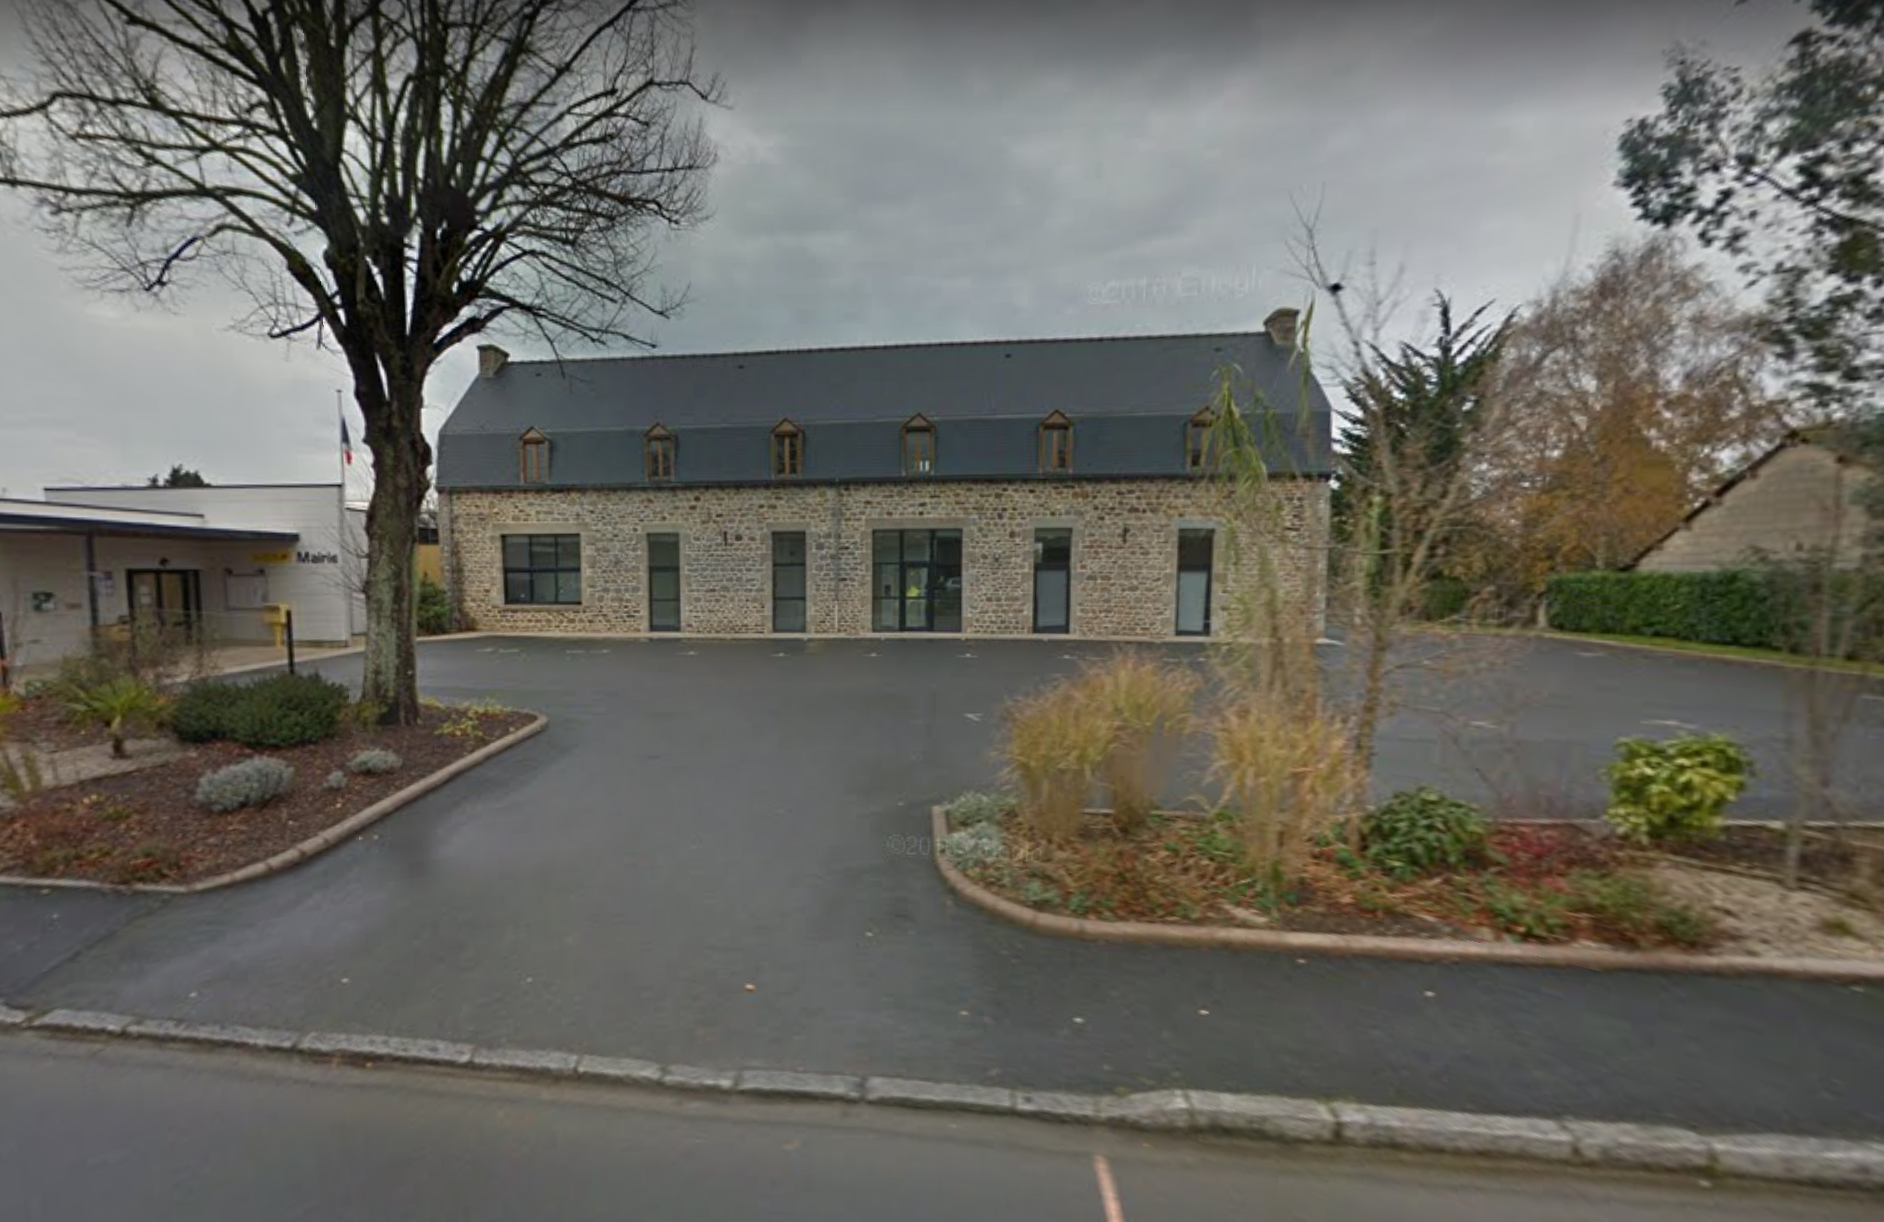 Le site de Lamballe-Armor